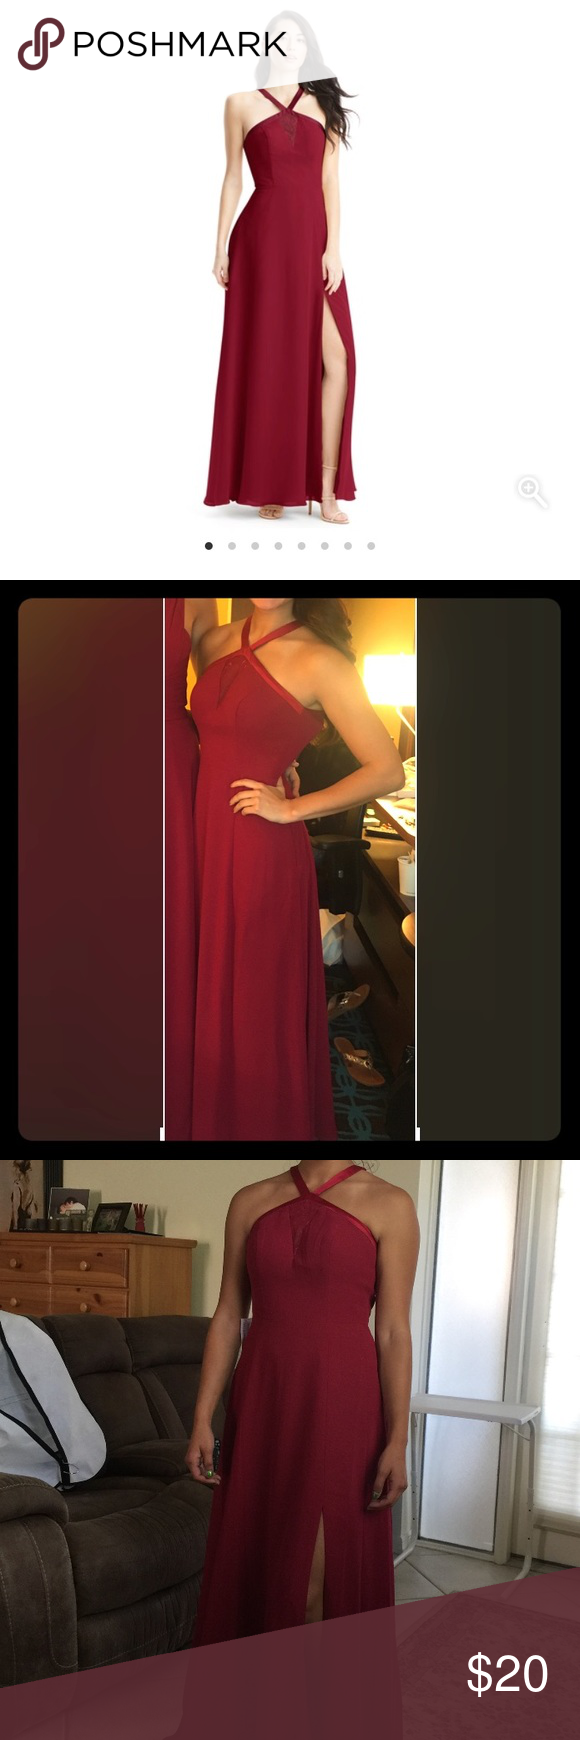 Burgundy azazie prom dress my posh closet pinterest burgundy